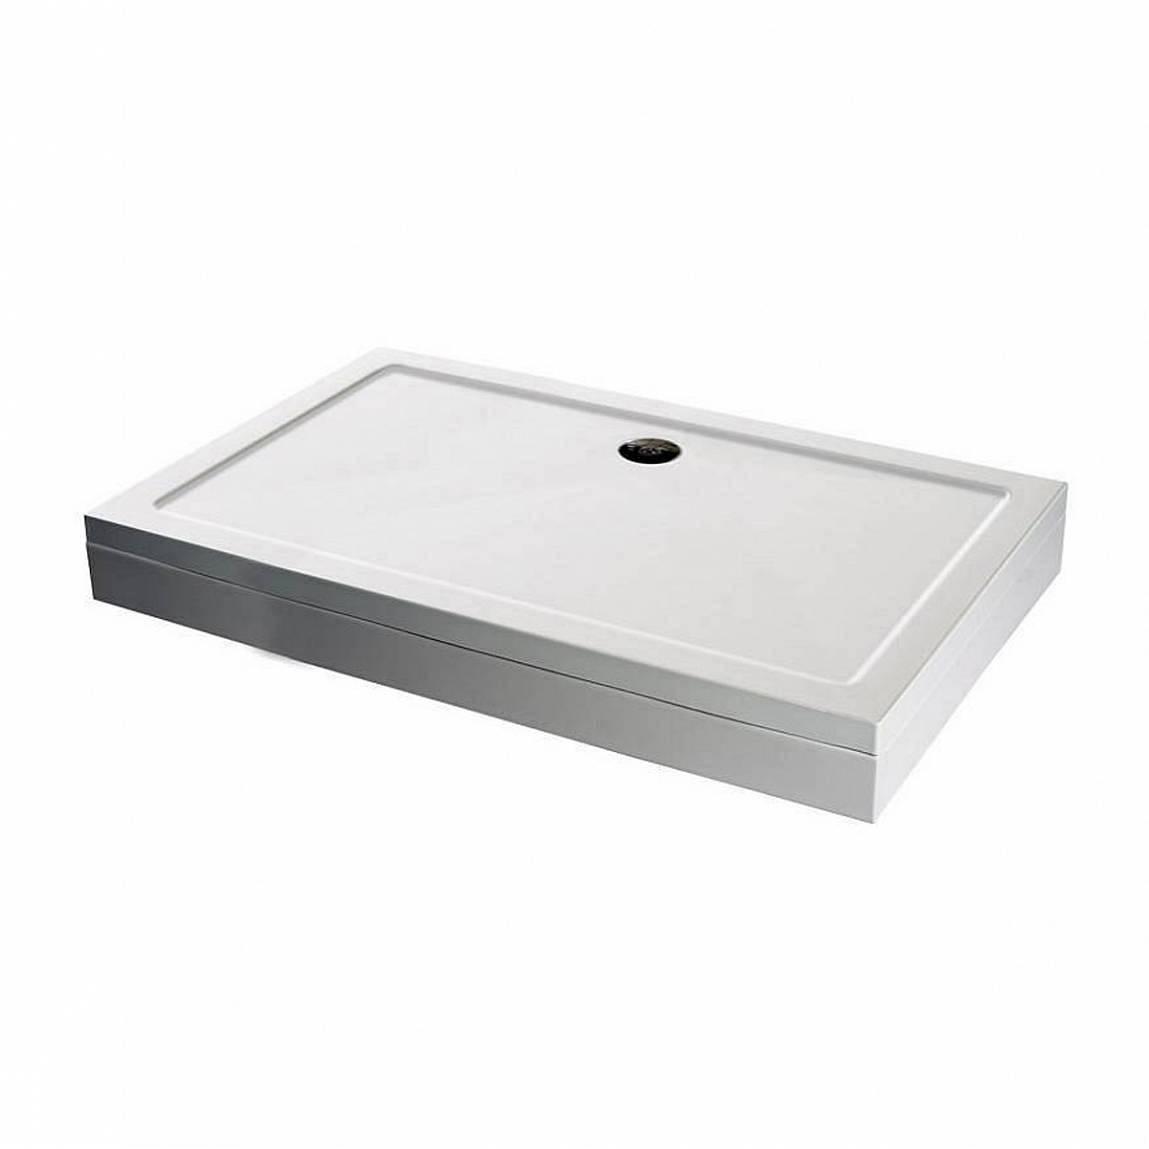 Image of Rectangular Stone Shower Tray & Riser Kit 1100 x 800